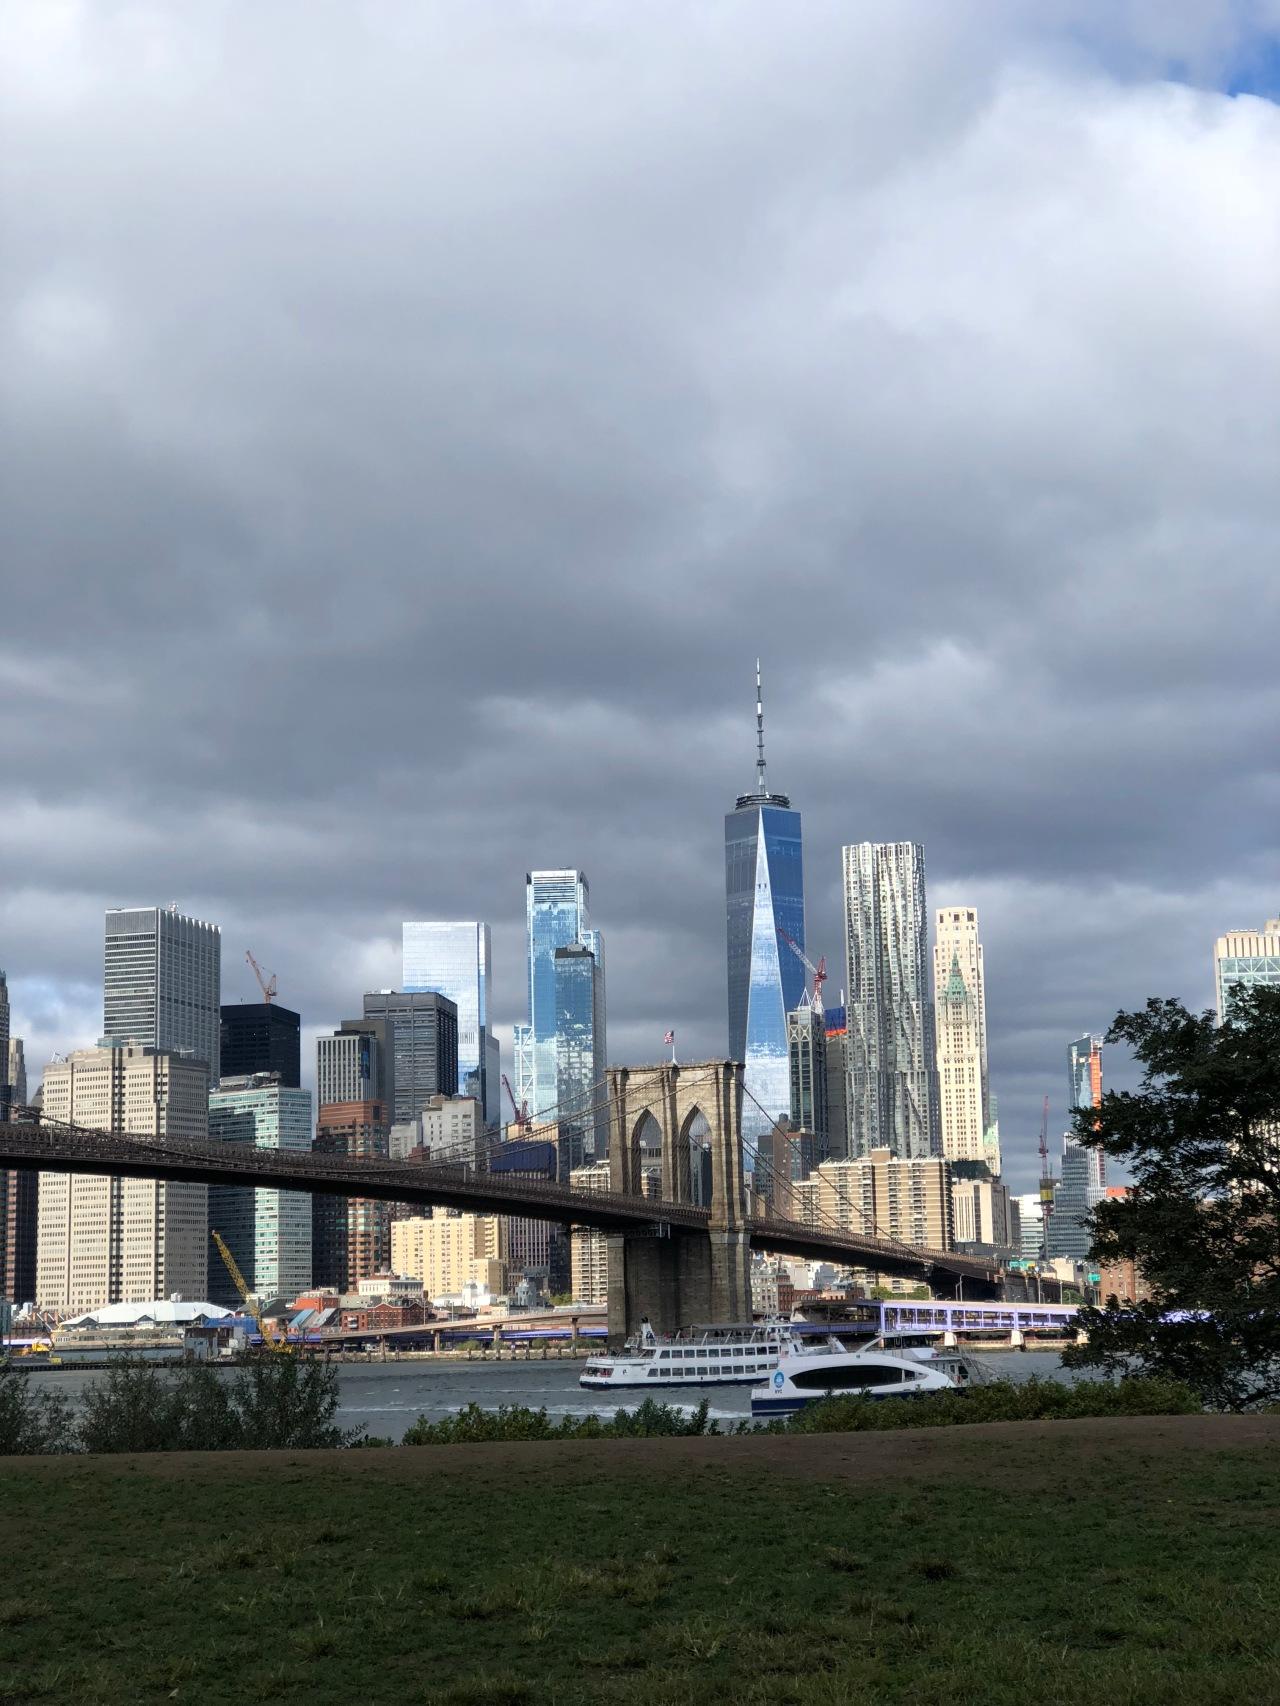 New York City Walks, BrooklynBridge